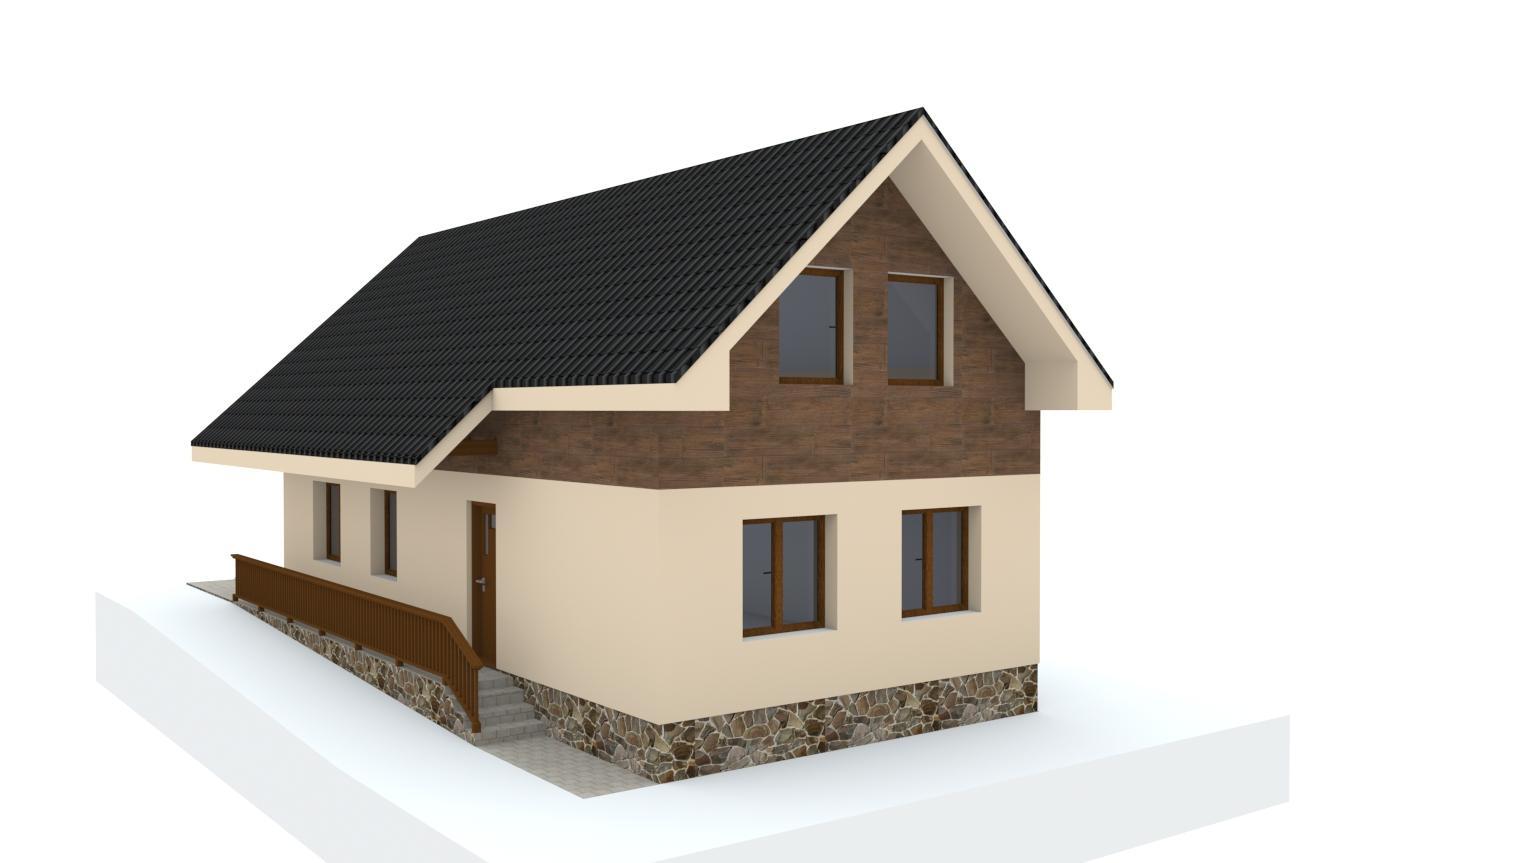 Návrh fasády rodinného domu - Obrázok č. 11